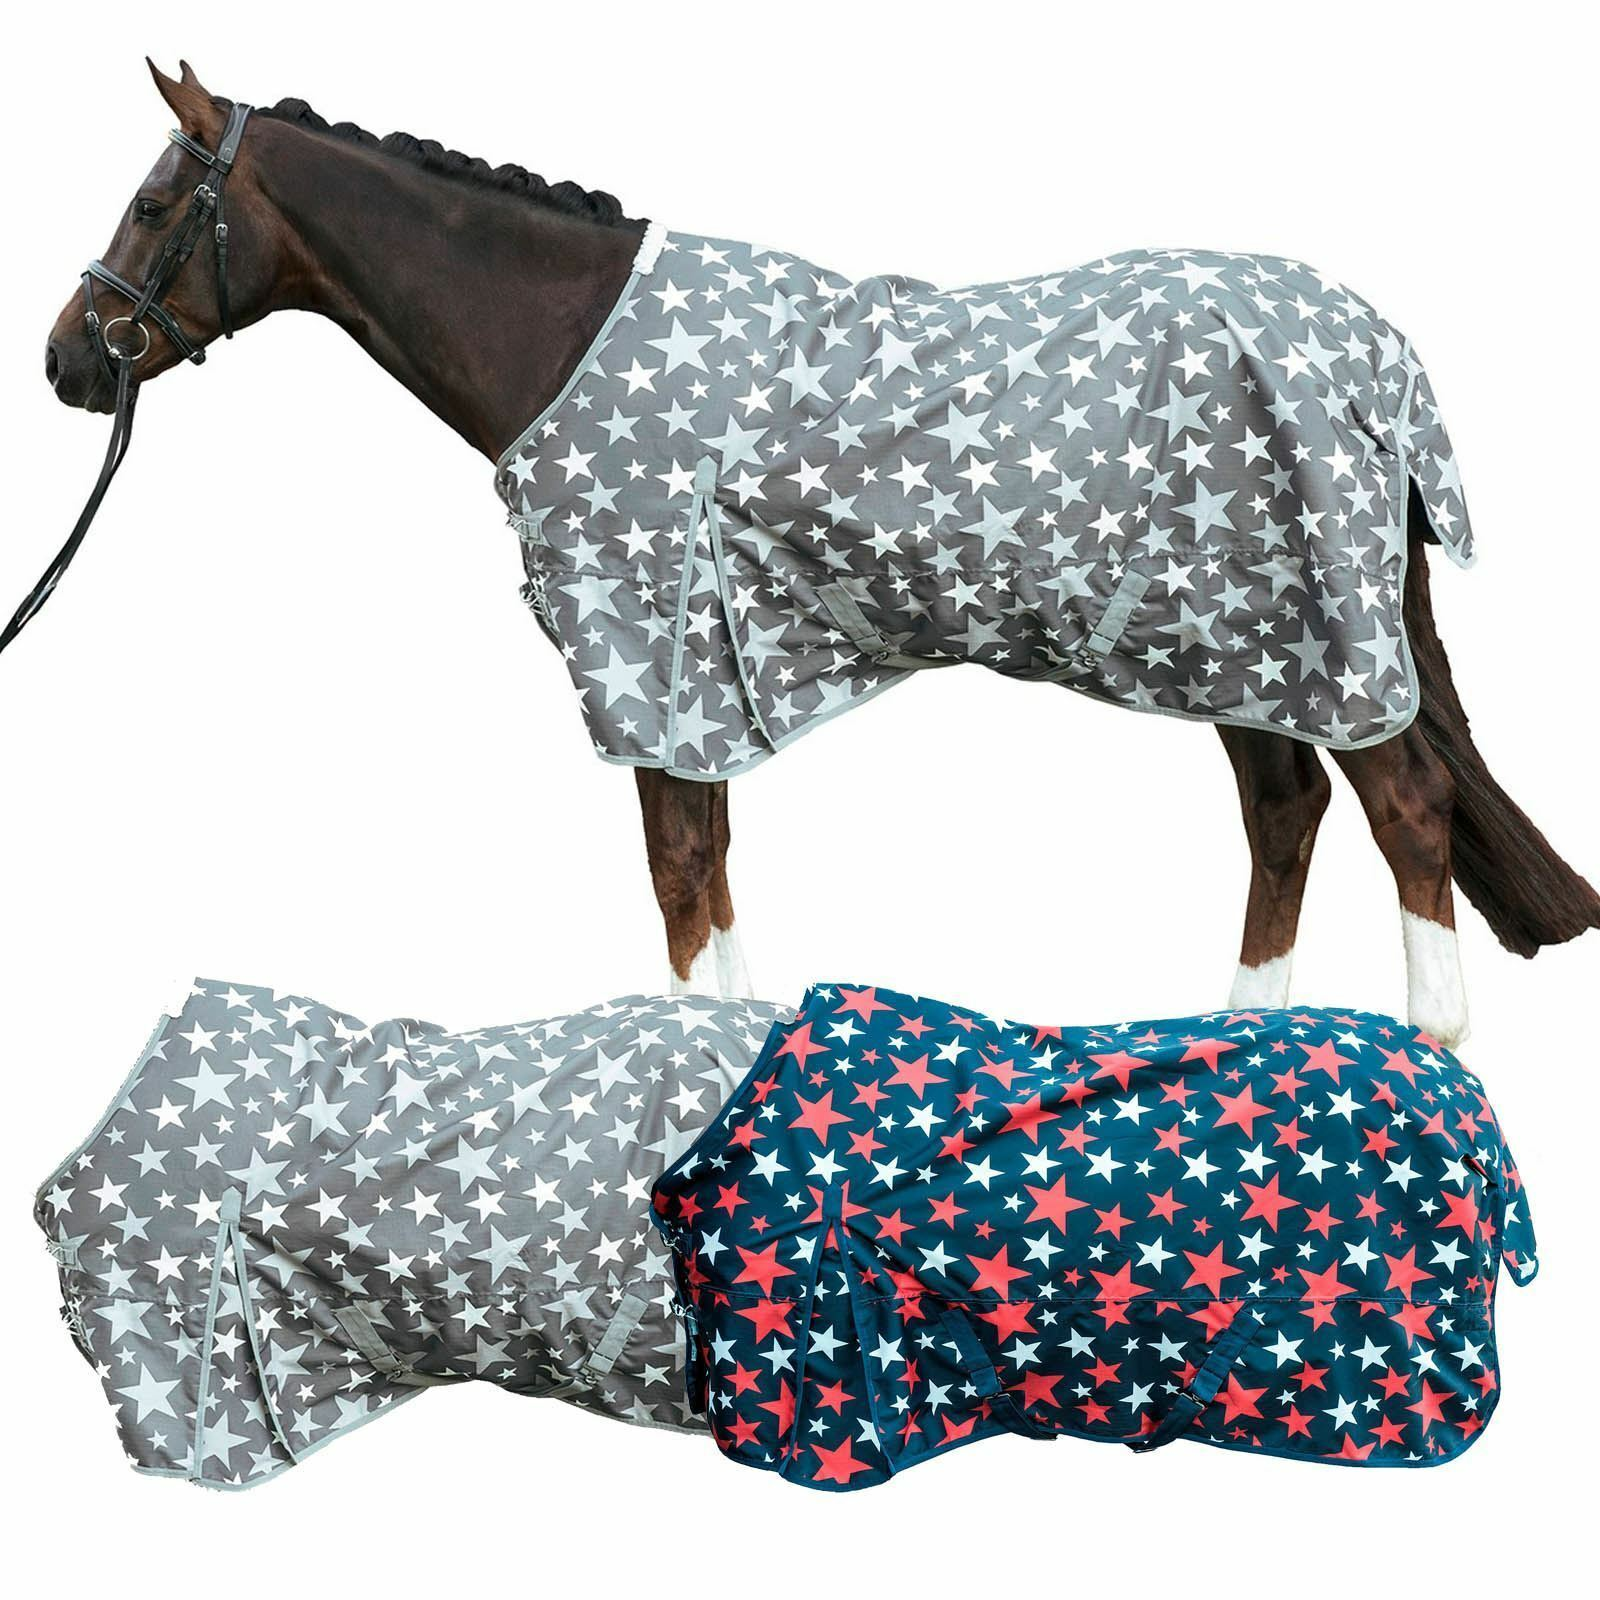 HKM Rain BlanketStar 600D Lightweight  Waterproof Long Horse Predection Blanket  sale with high discount